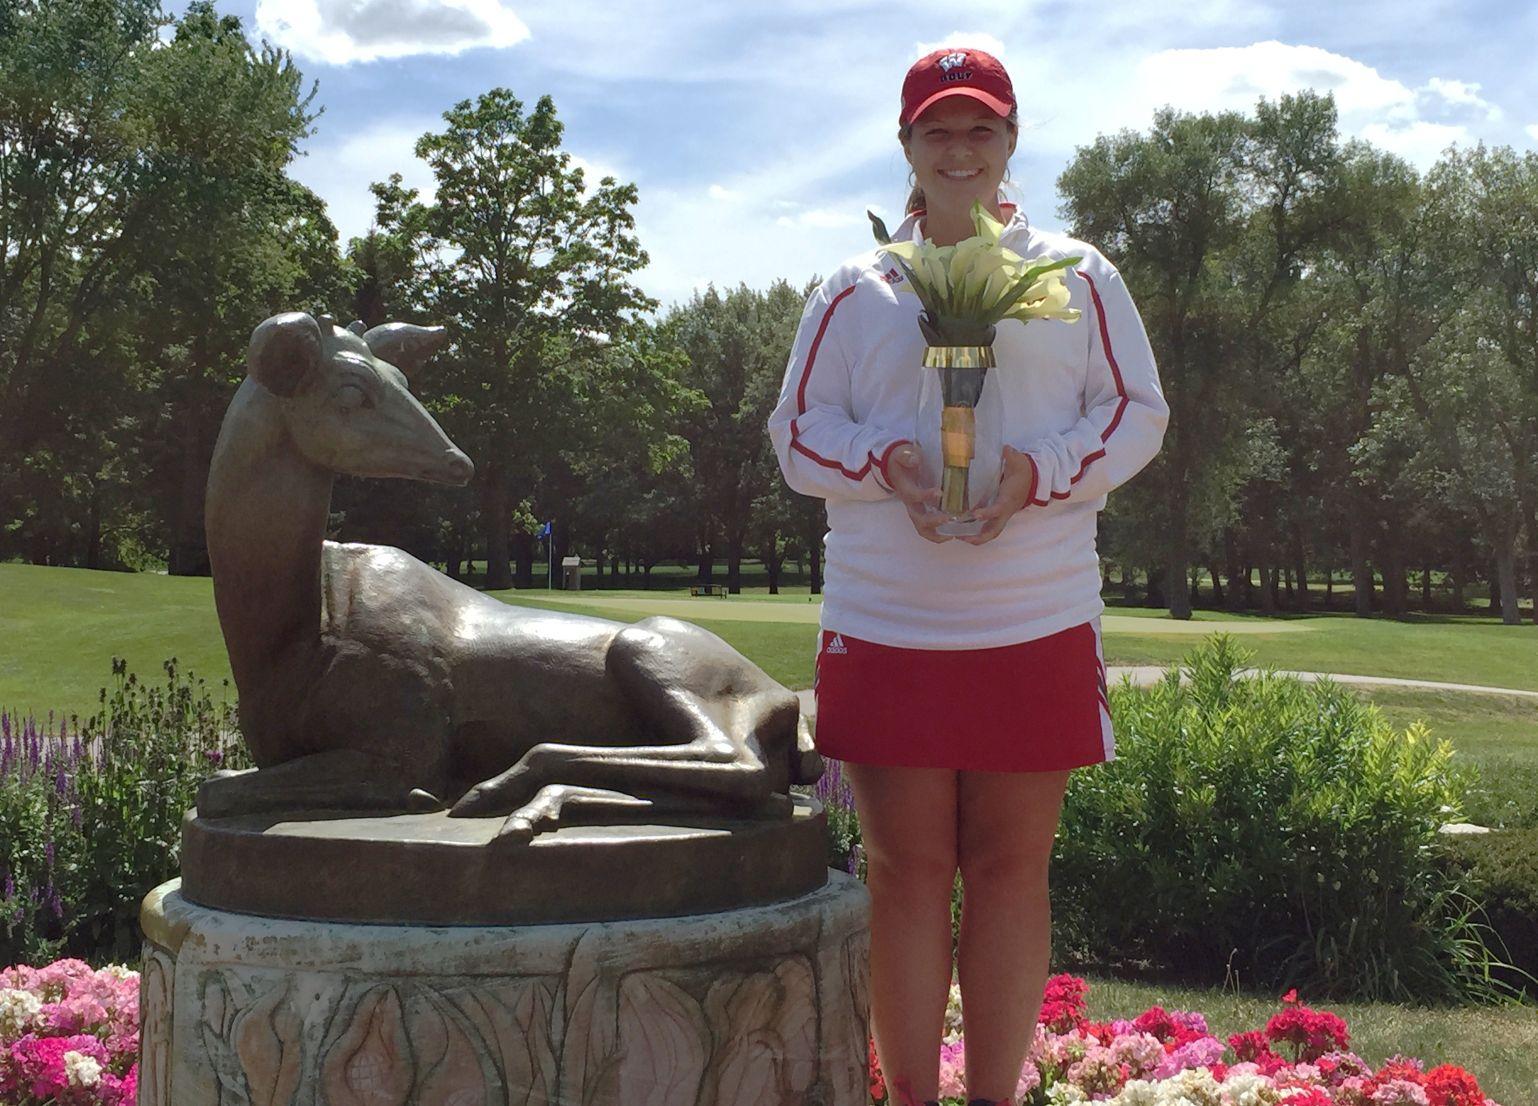 Wisconsin amateur golf tournament